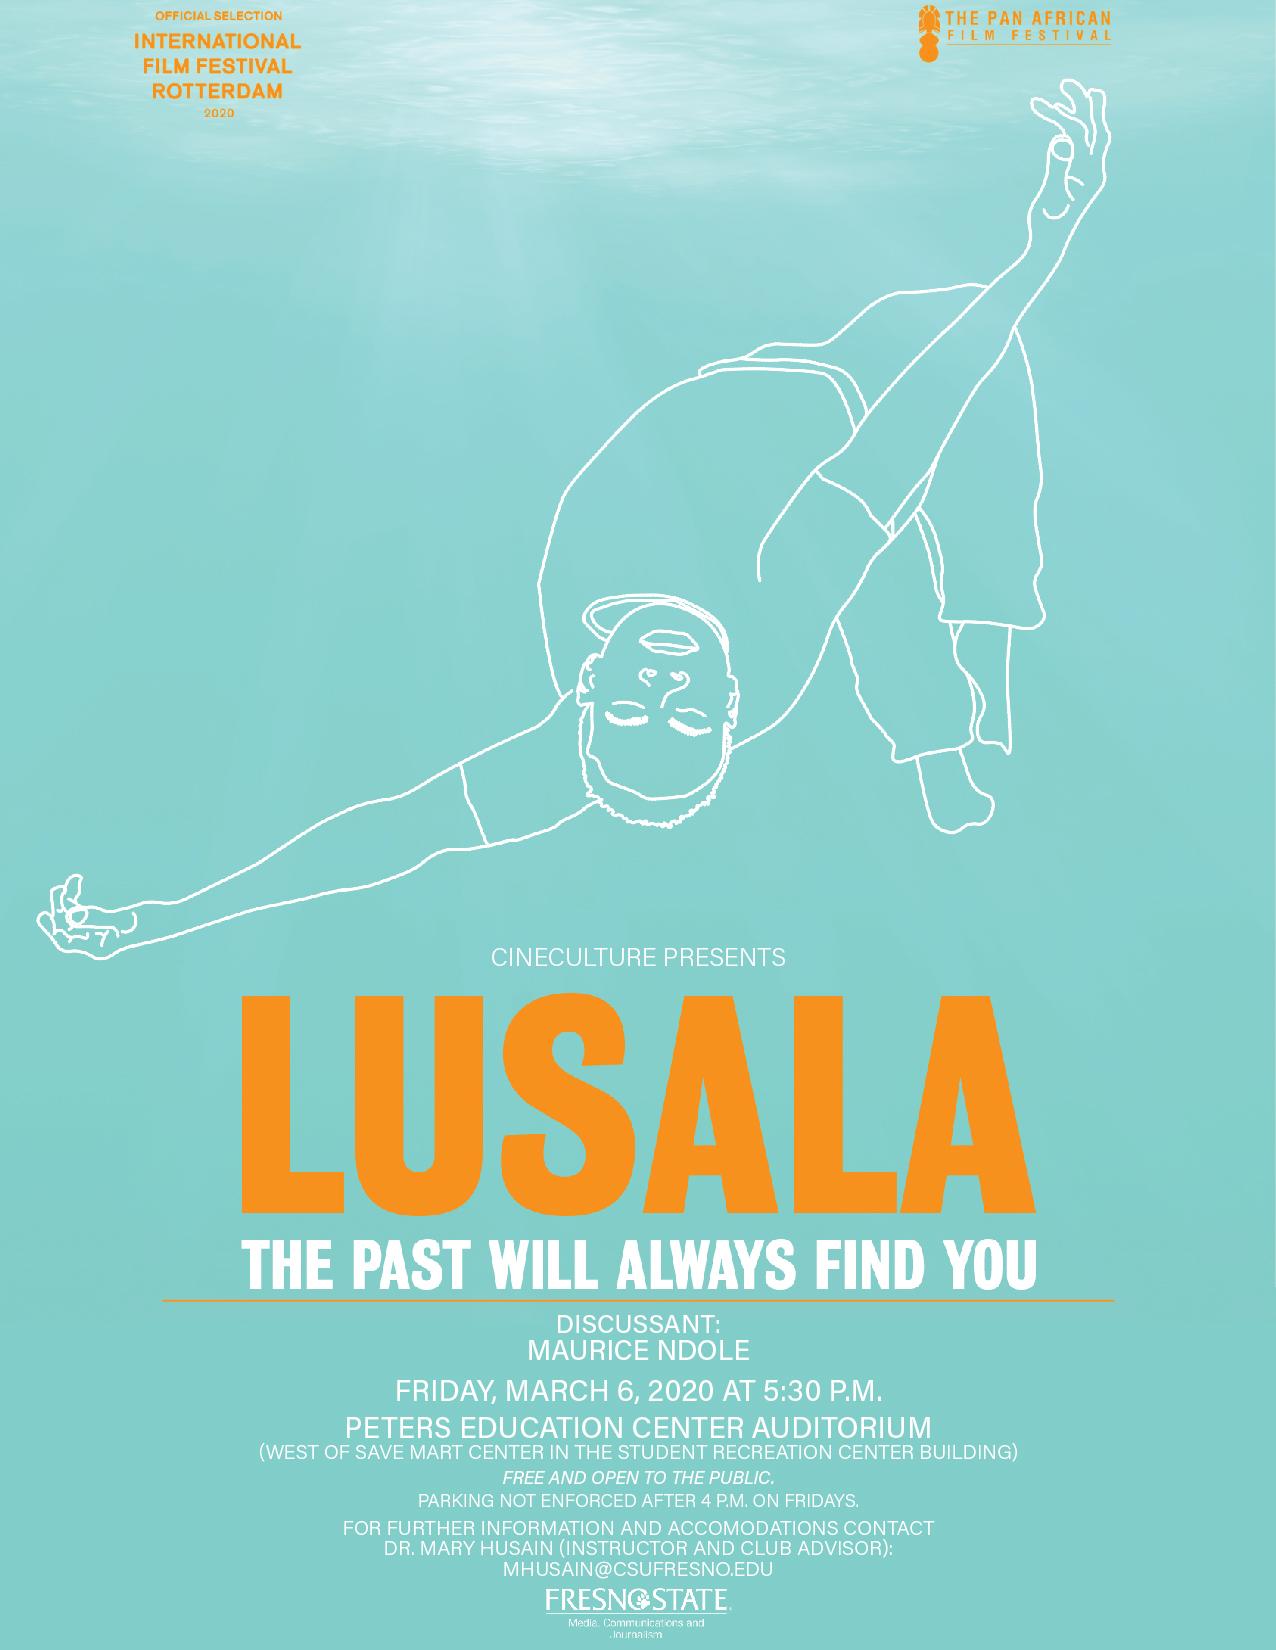 lusala_cc2020_web-01